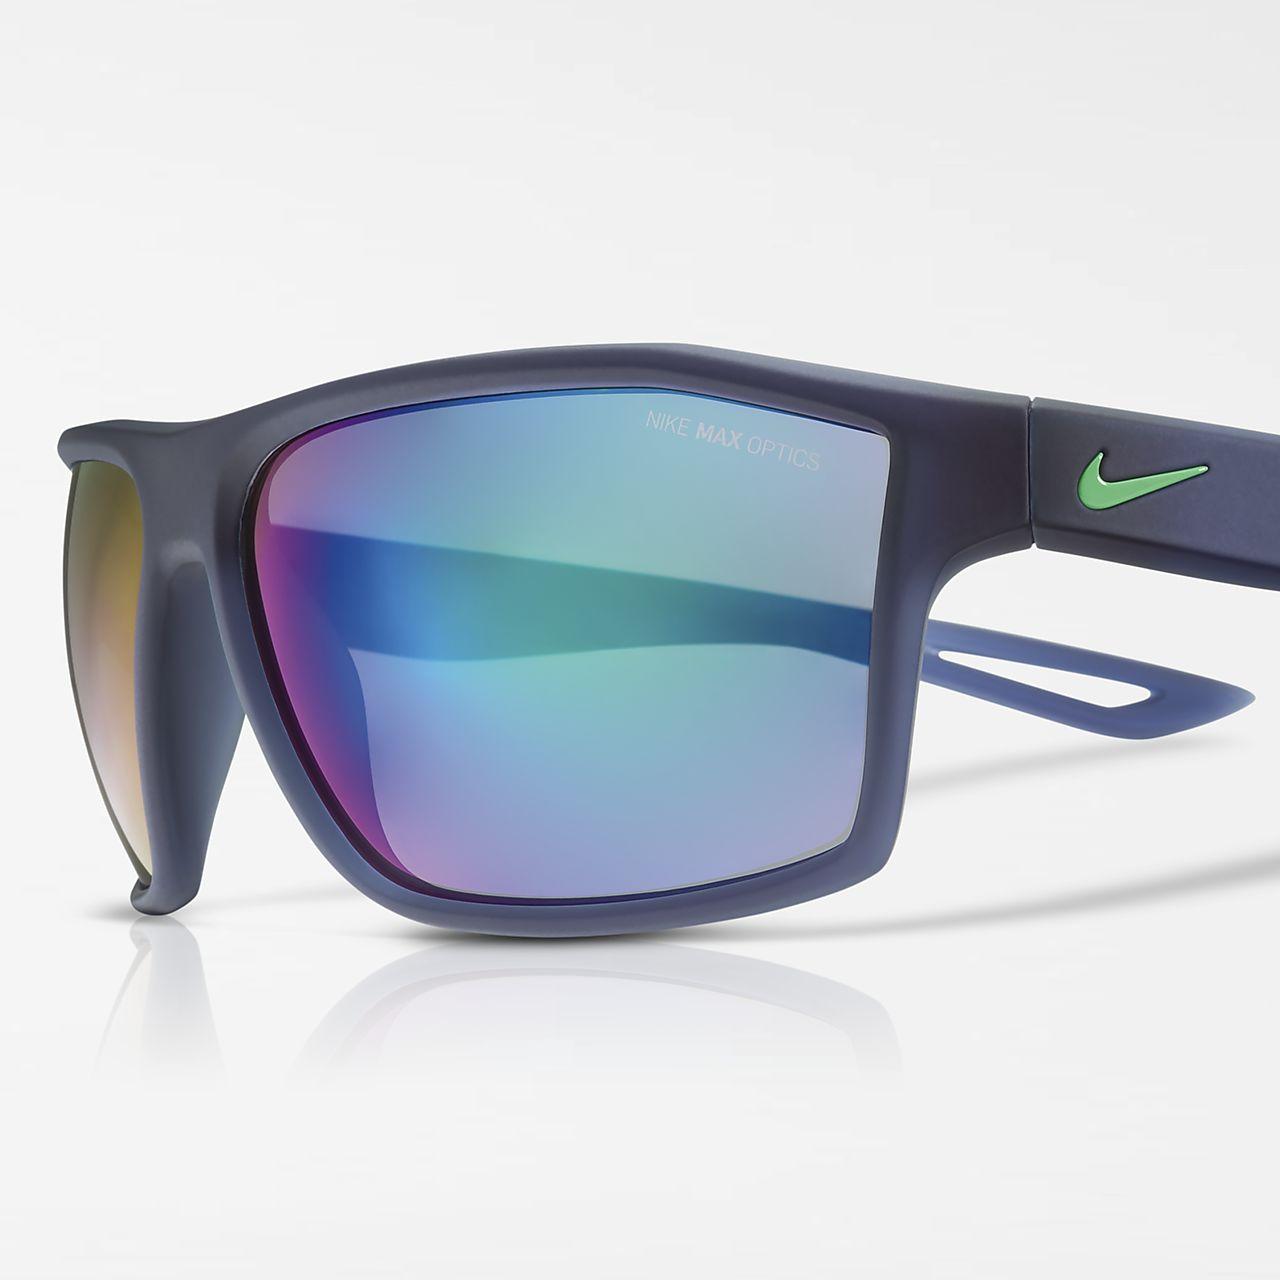 Nike Lunettes de soleil Terminus Mirrored EvTte